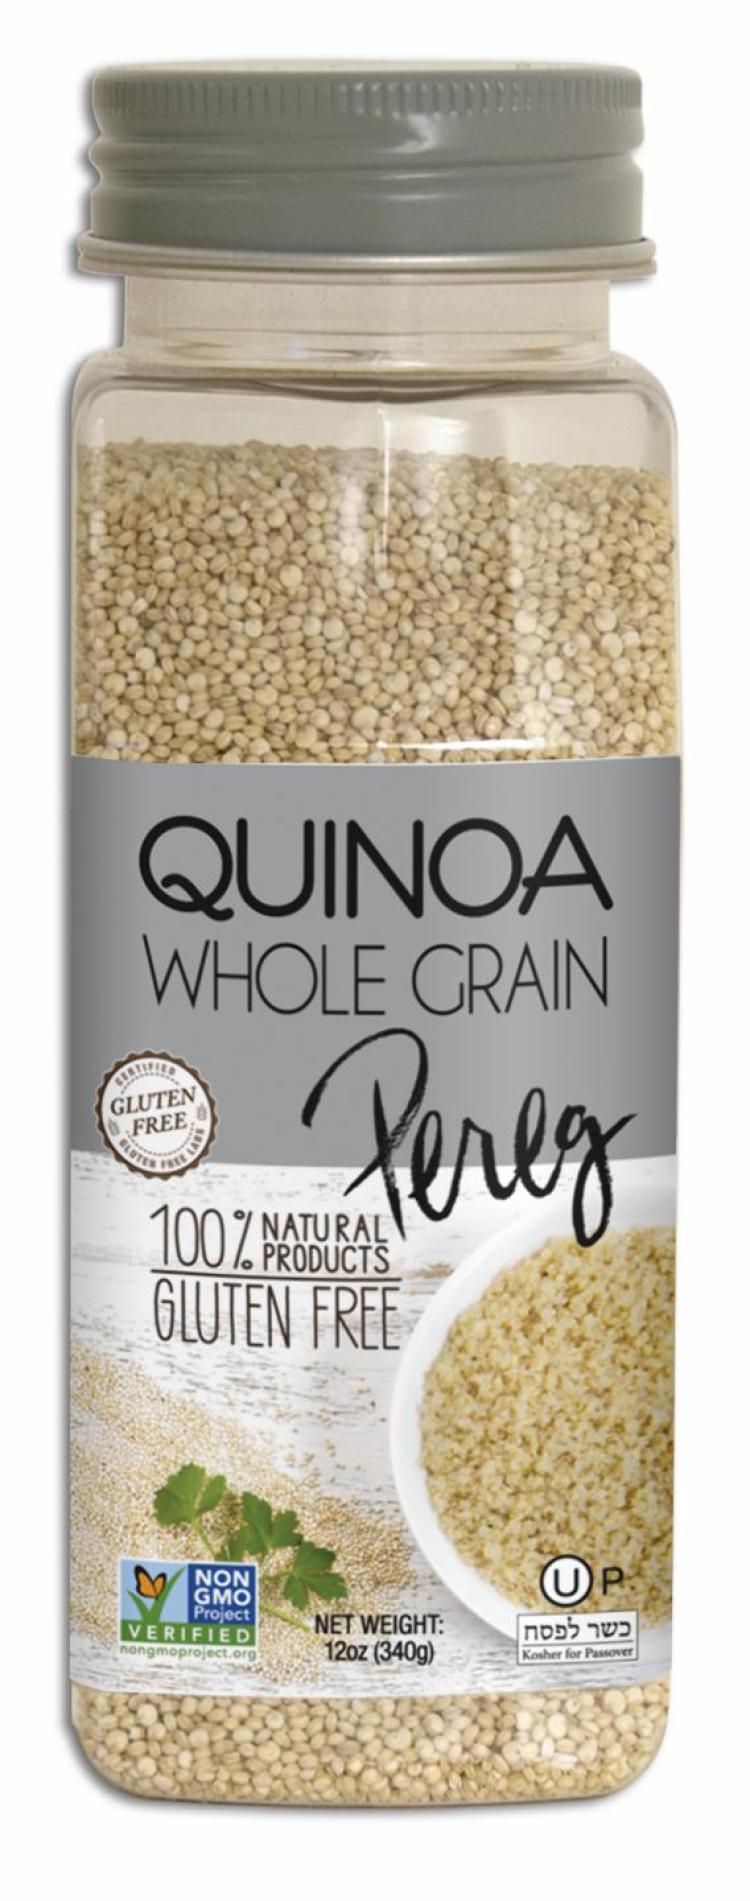 Quinoa Kosher For Passover  Don t pass these new kosher goo s over NY Daily News